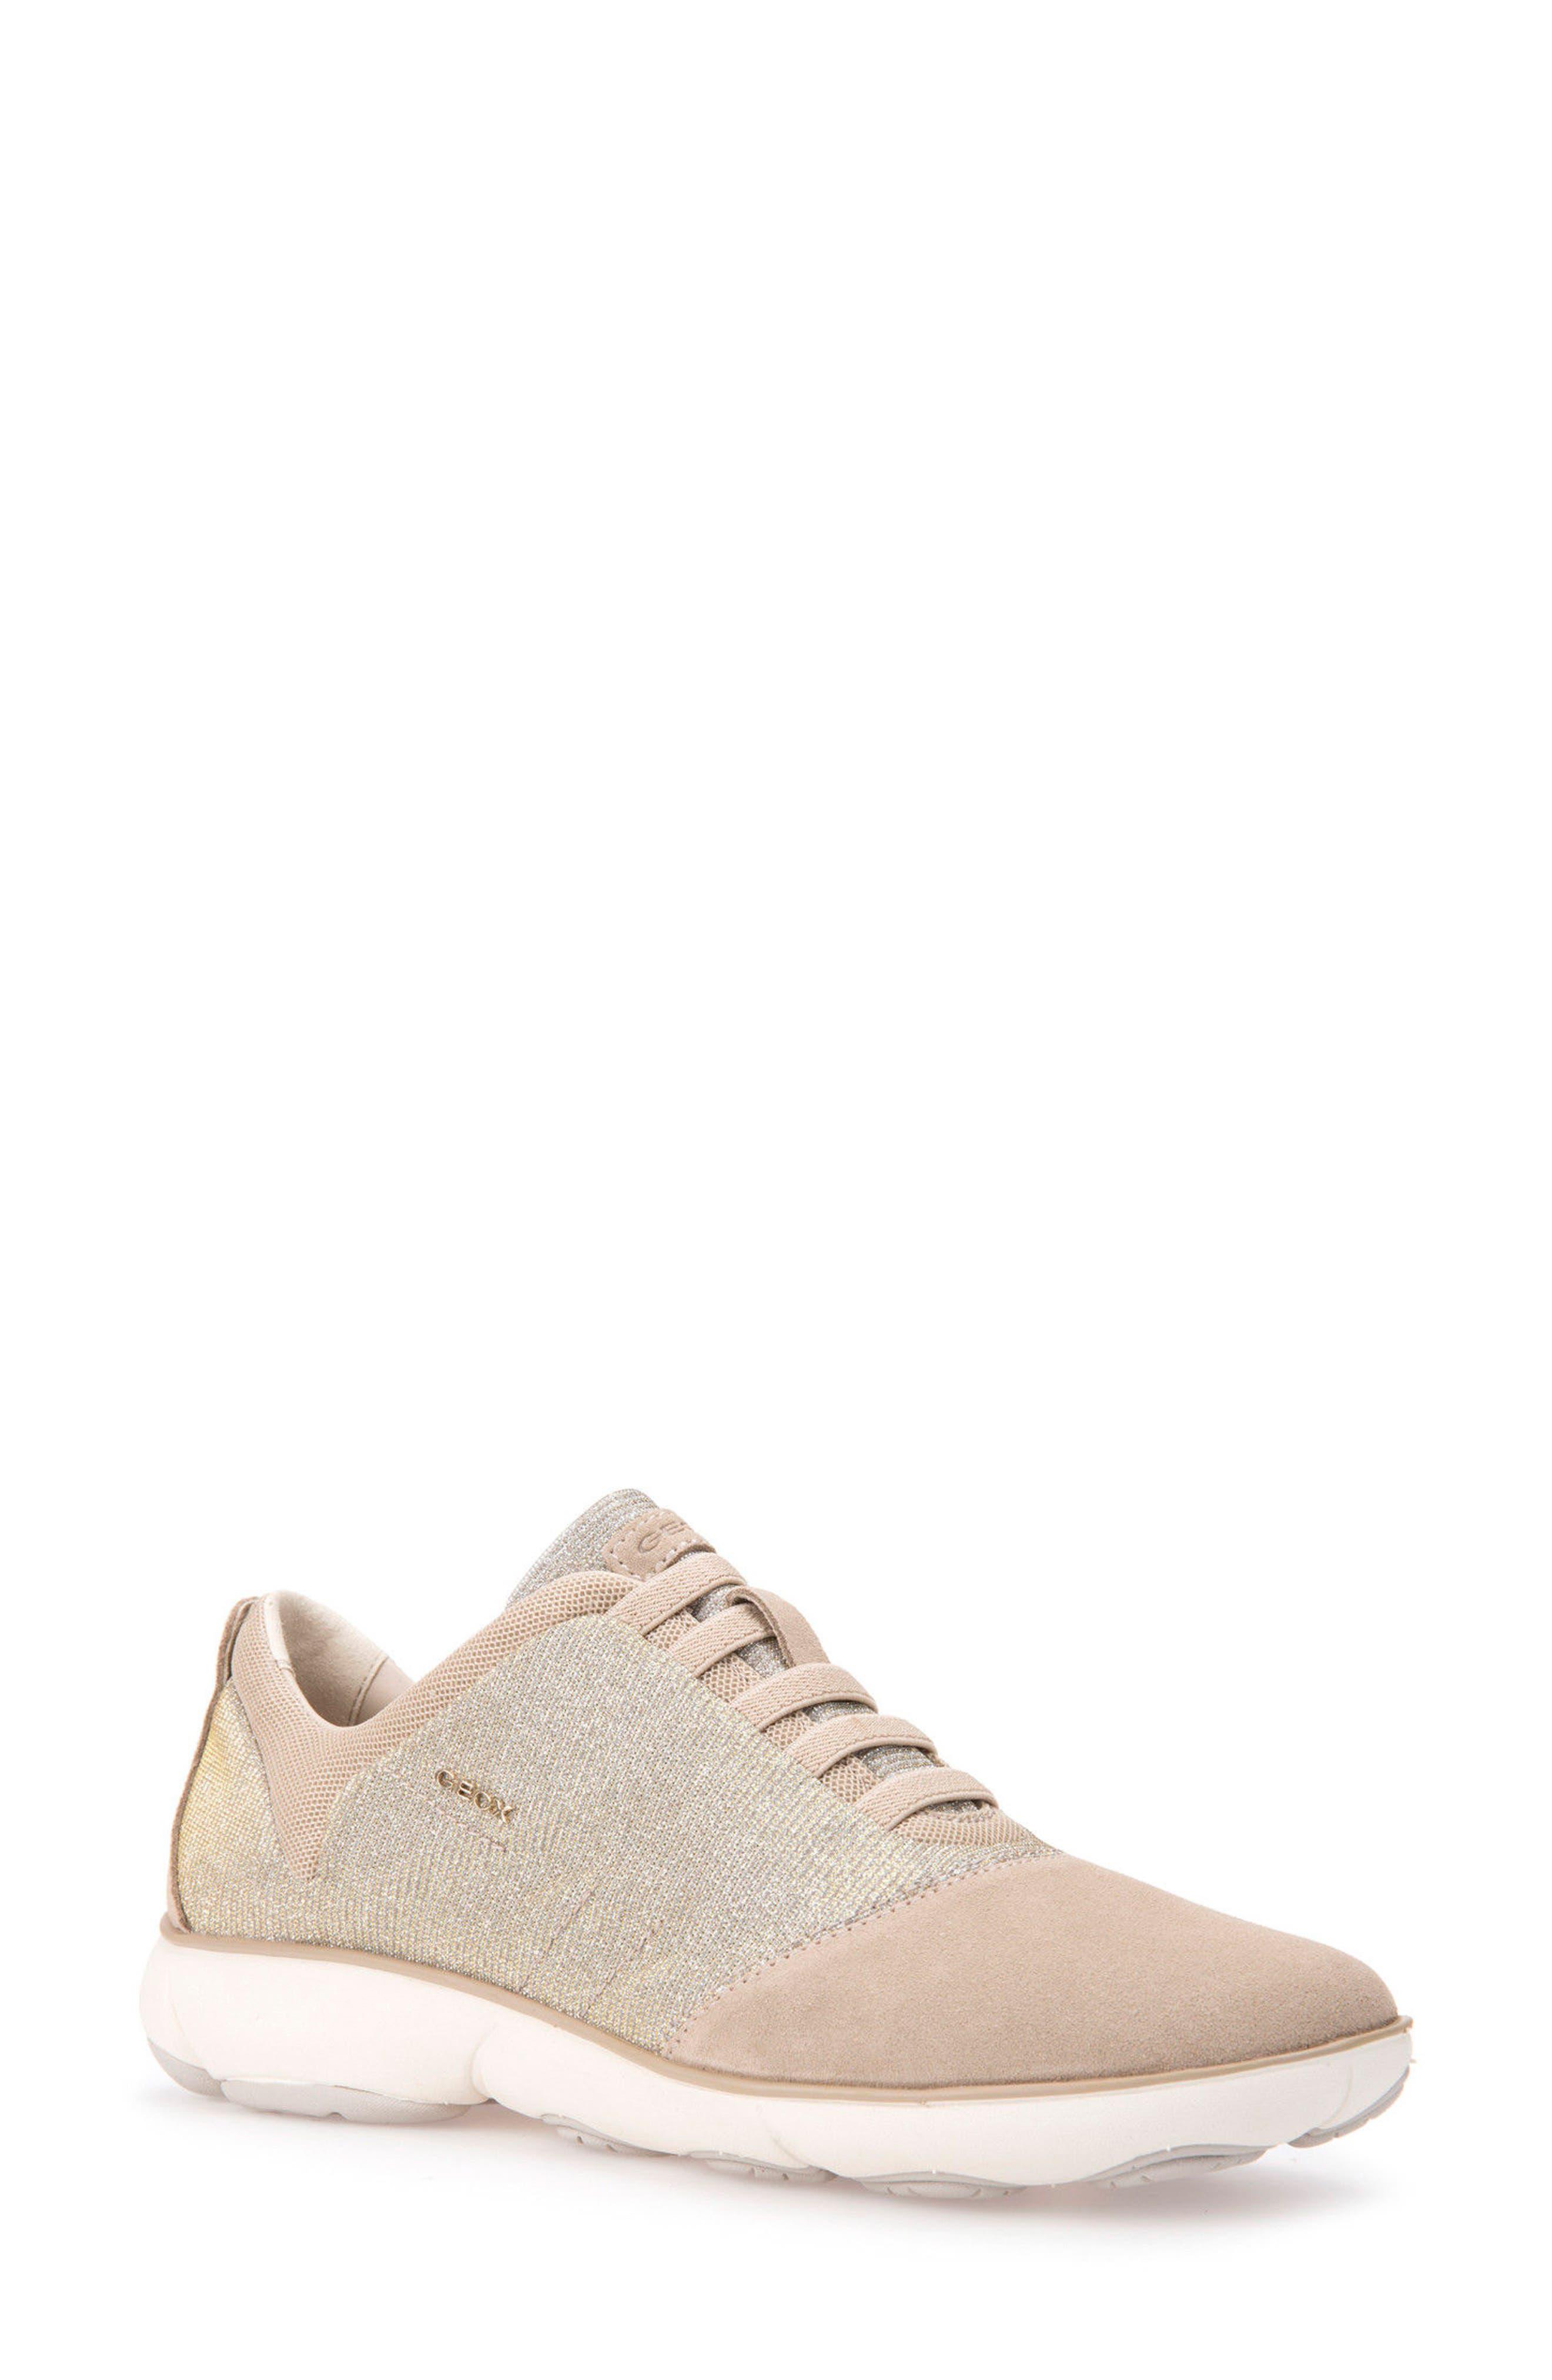 Nebula Slip-On Sneaker,                             Main thumbnail 1, color,                             Taupe Fabric